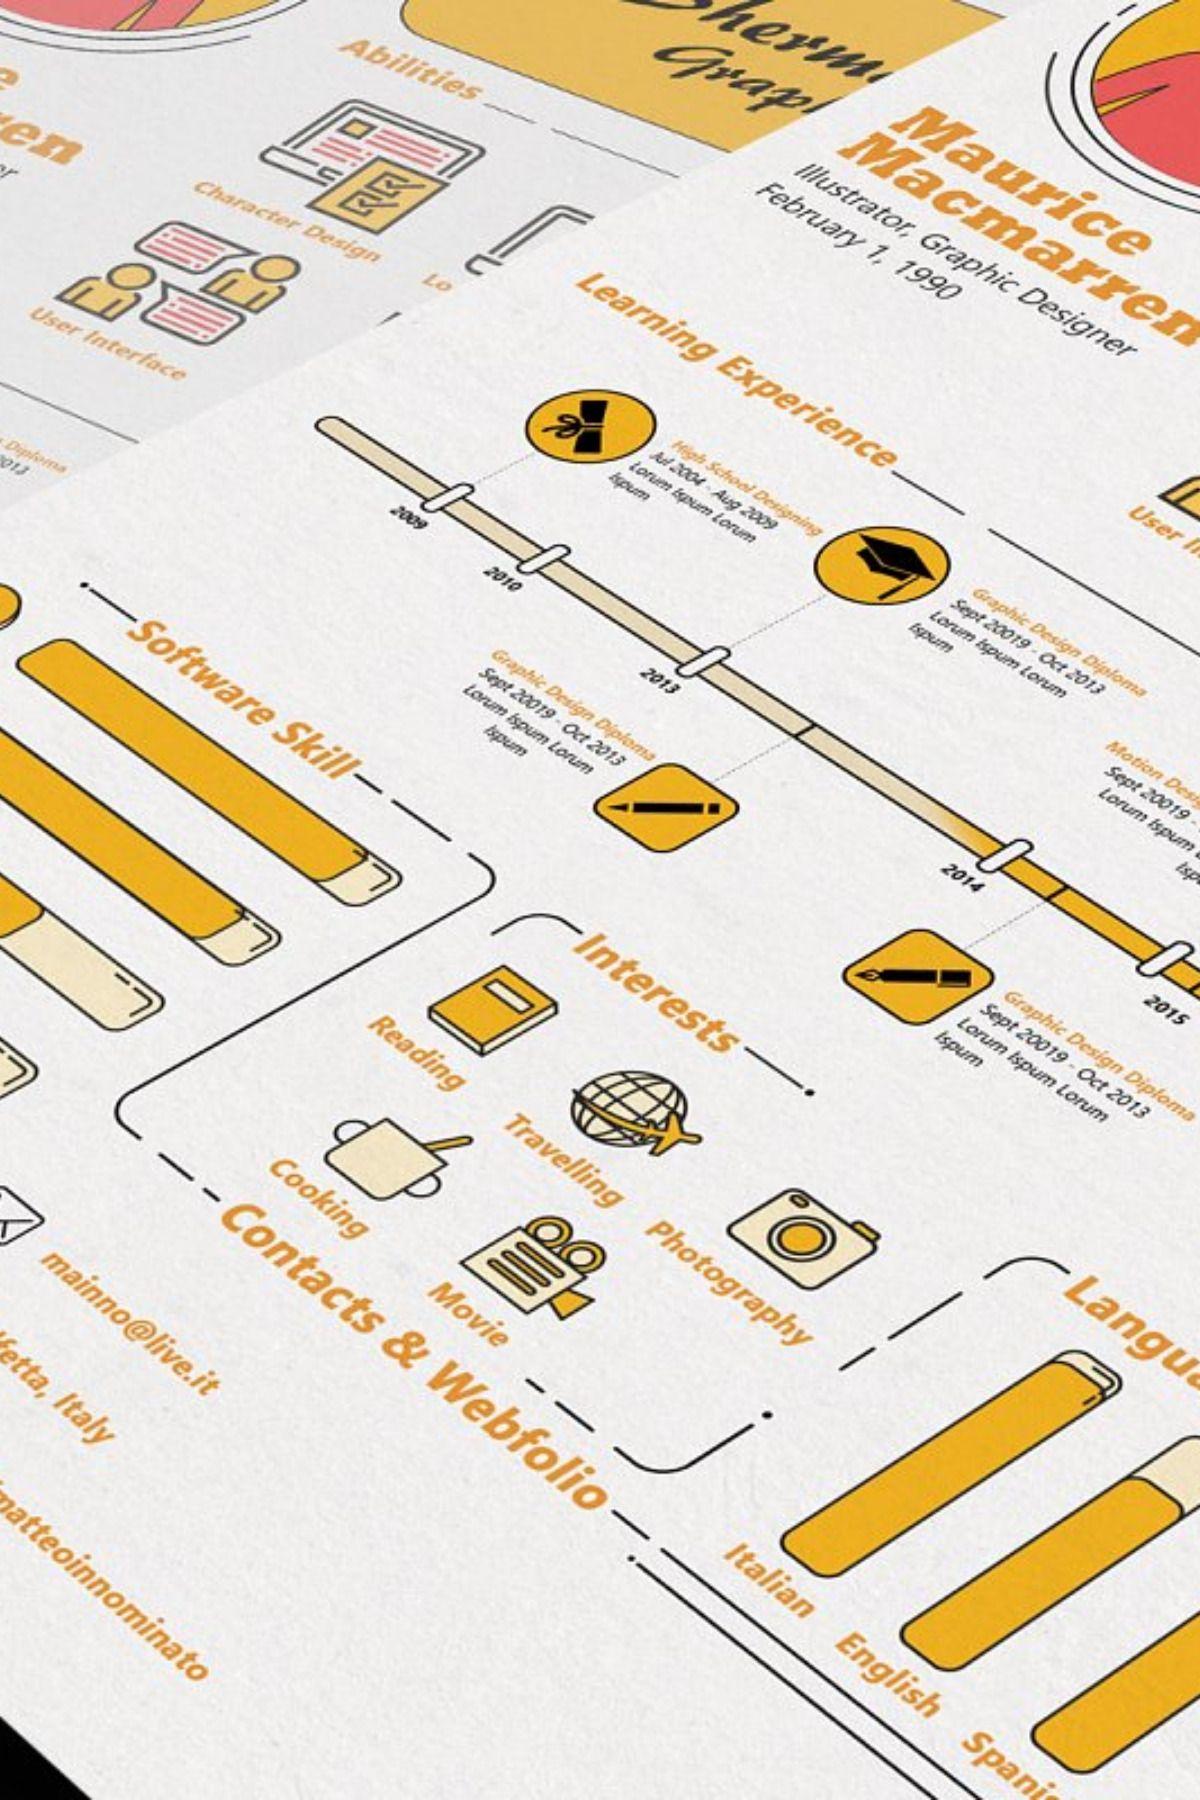 Creative Designer Resume Template Resume template